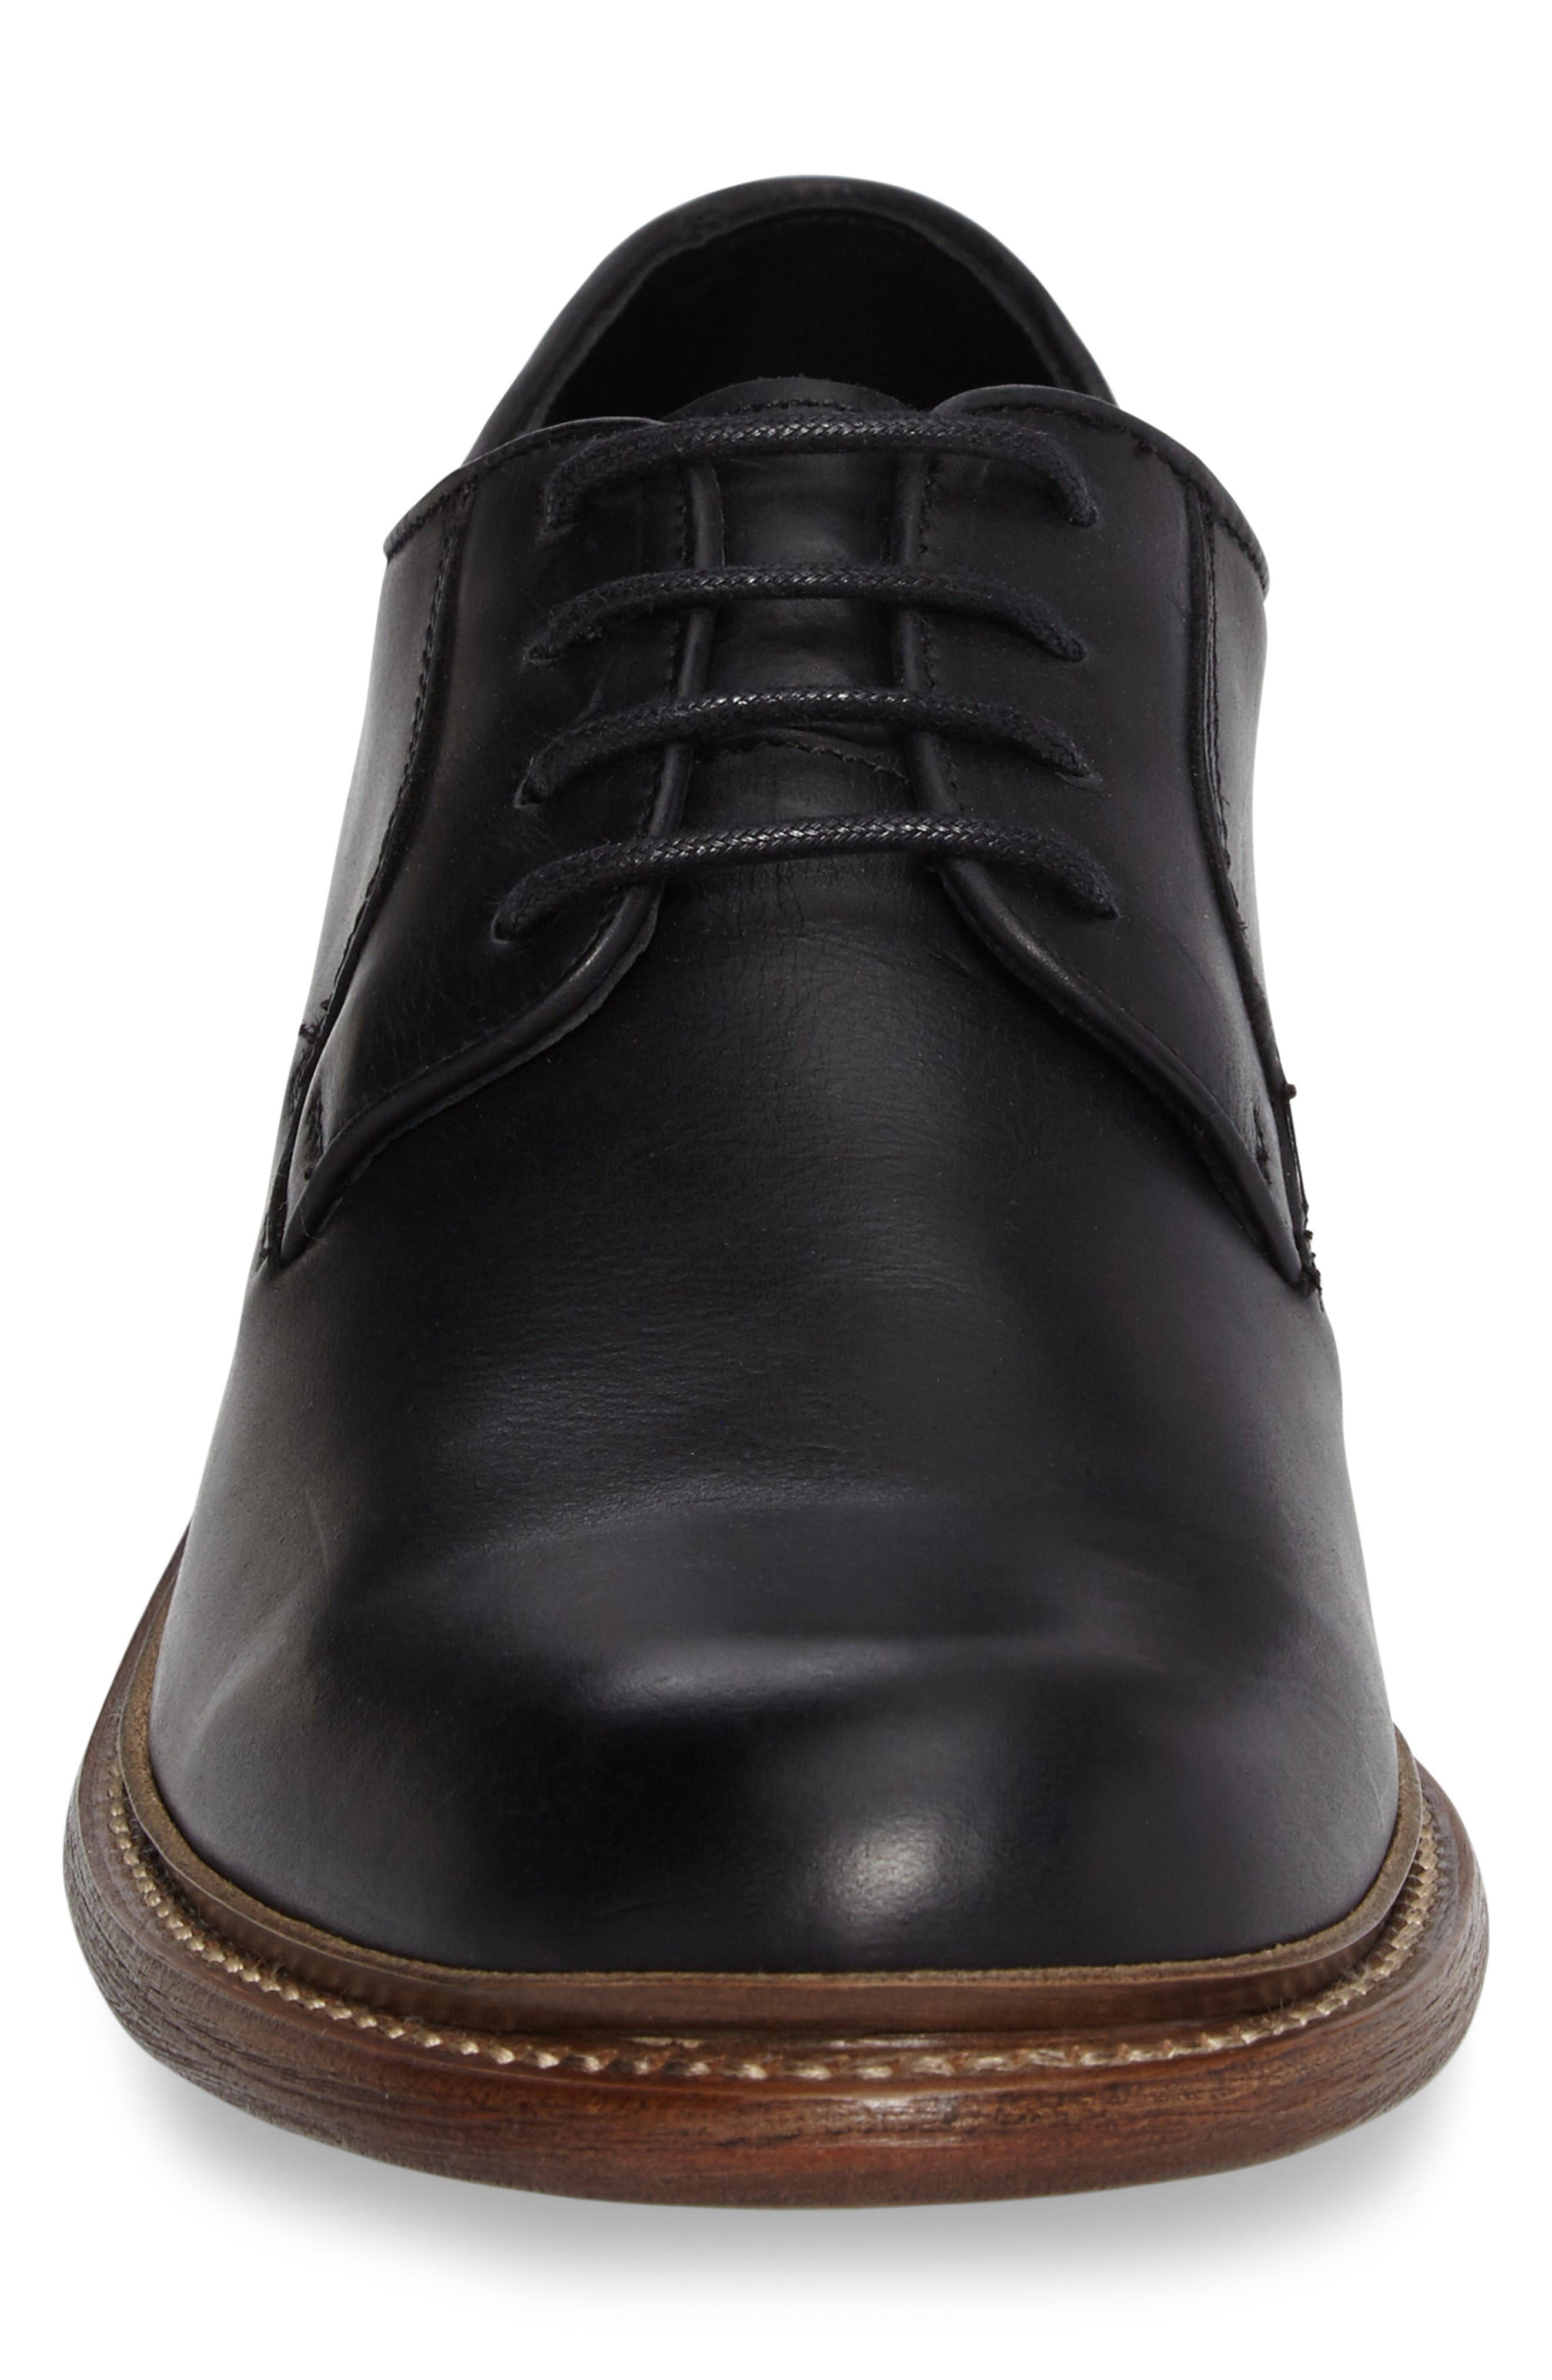 1000 Mile Luke Plain Toe Derby,                             Alternate thumbnail 4, color,                             Black Leather